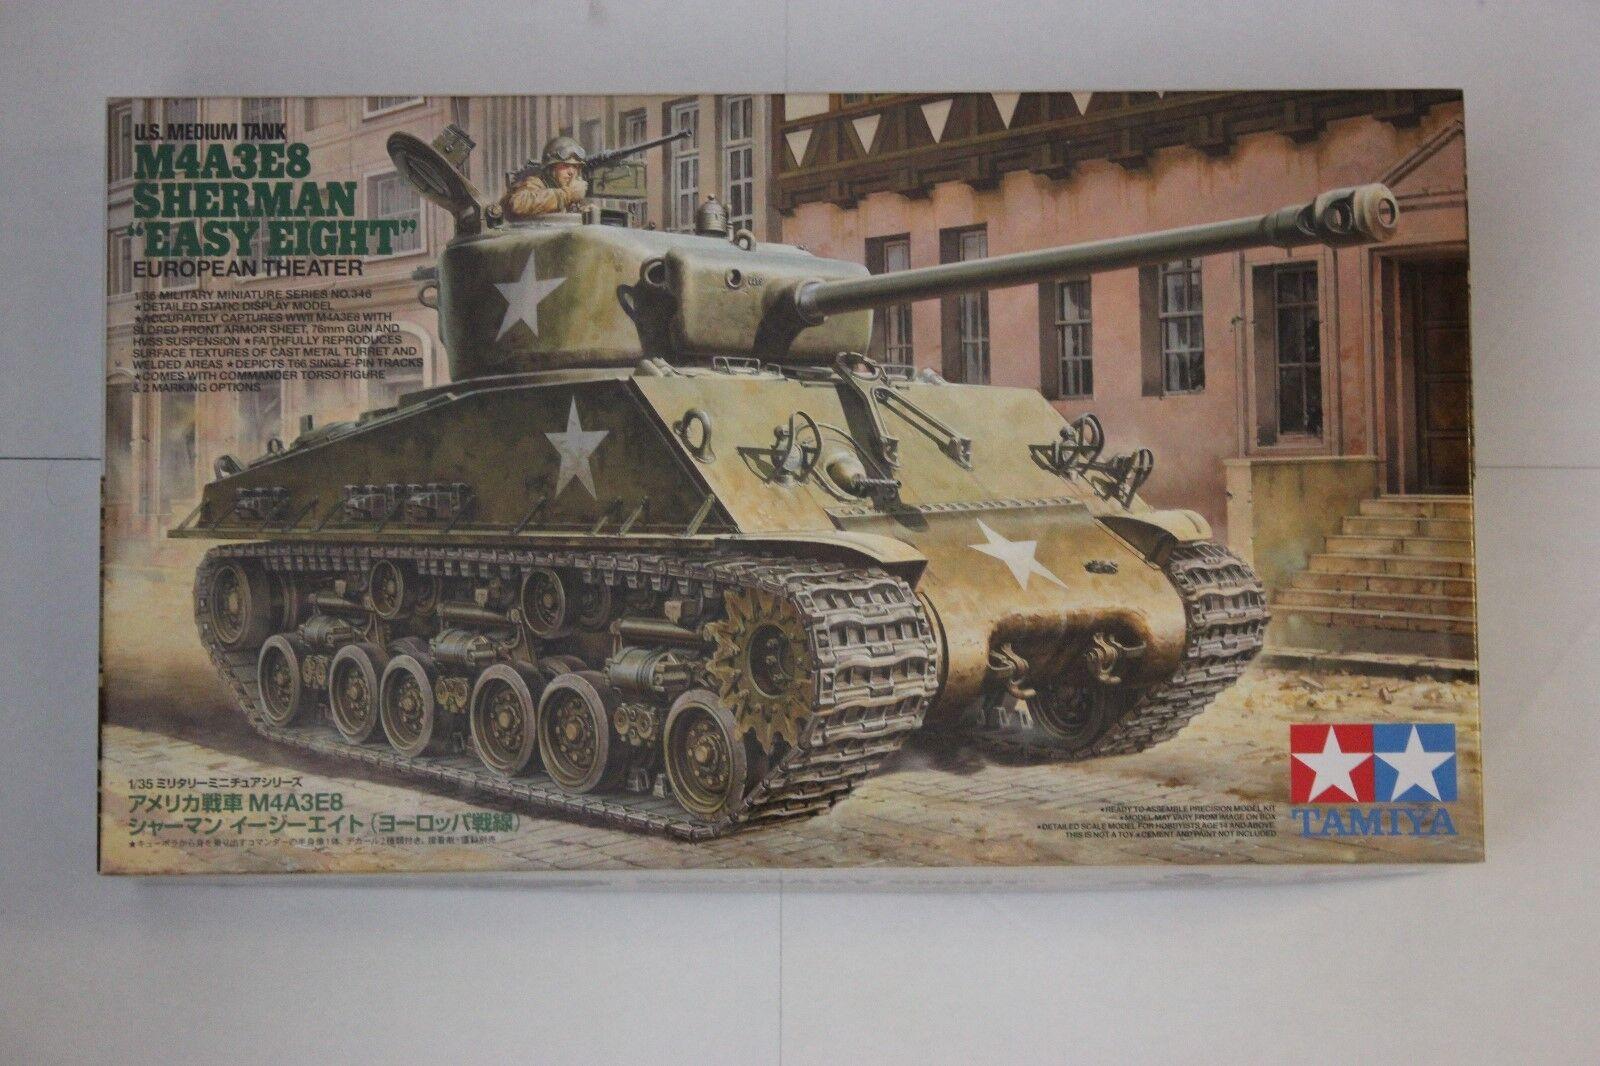 TAMIYA 35346 US M4A3E8 Sherman Easy 8 1 35 Tank Model Kit